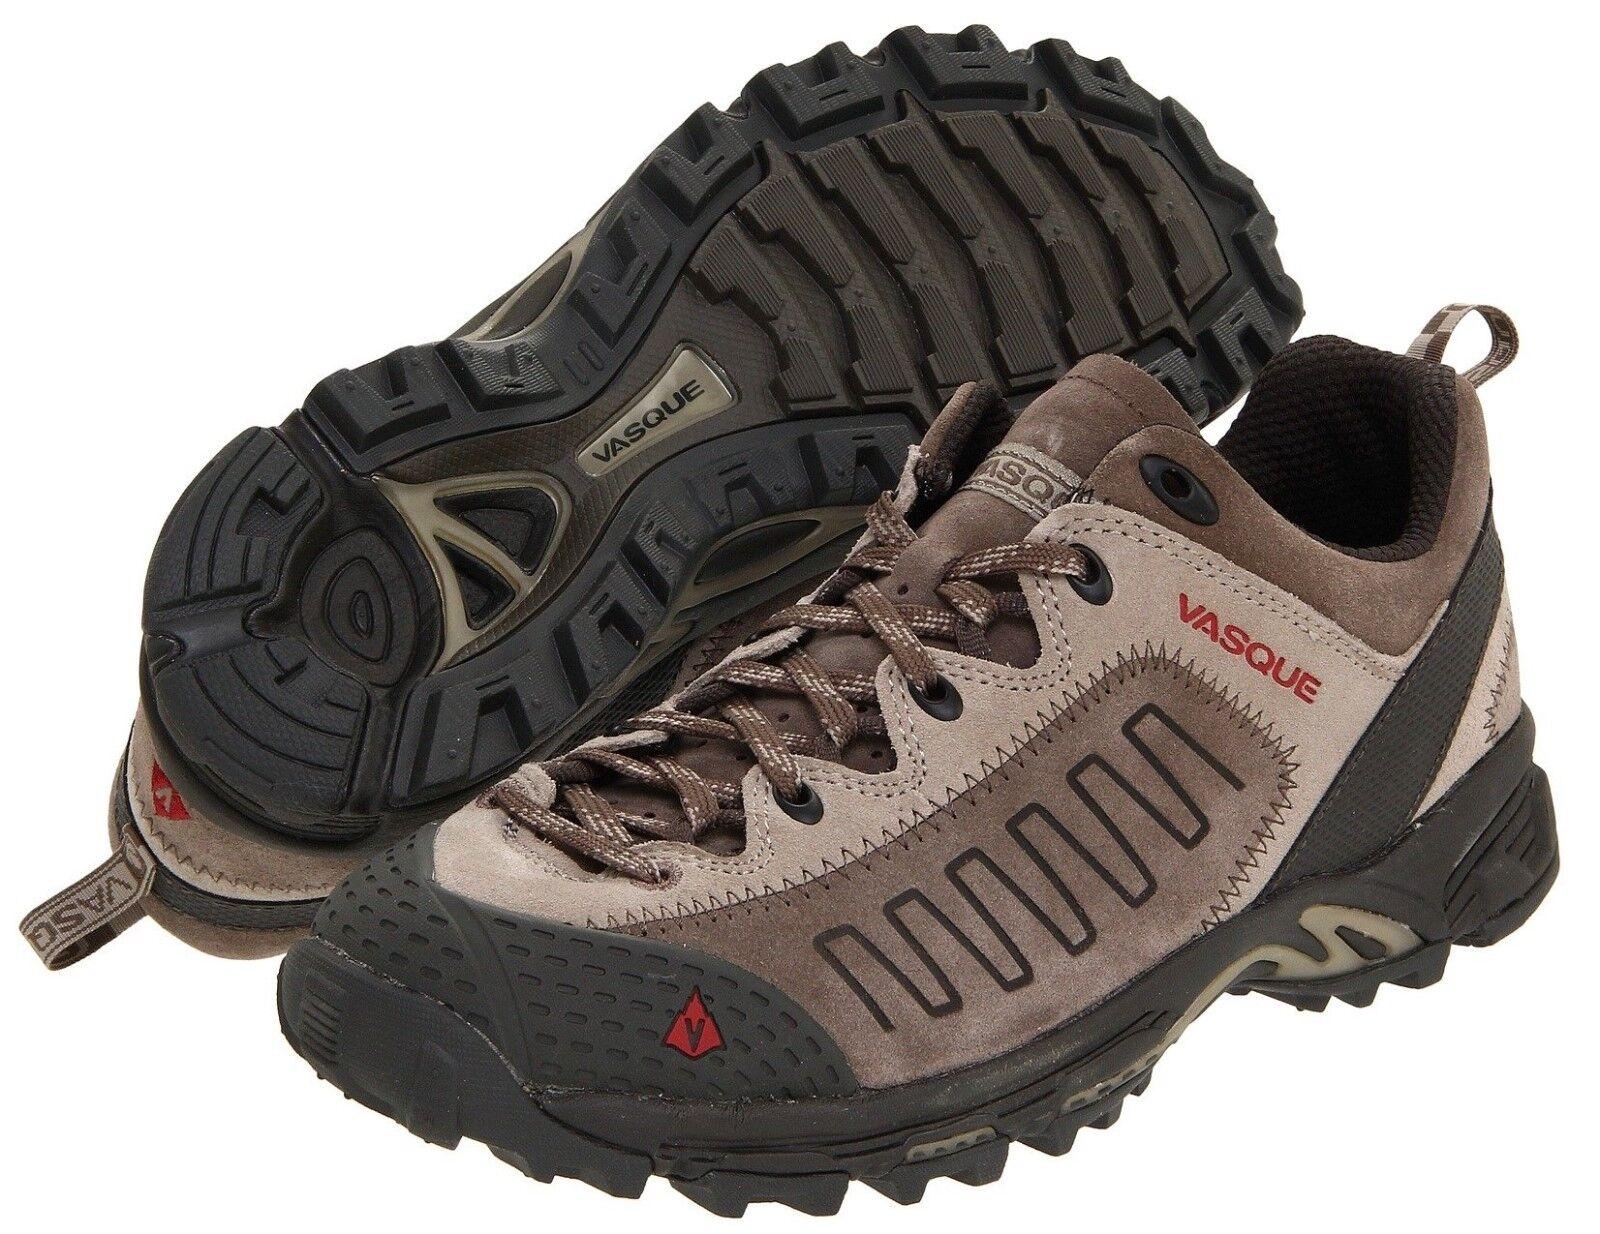 Vasque Juxt Sneakers Men's Hiking shoes Running Comfort Sport Backpacking NIB